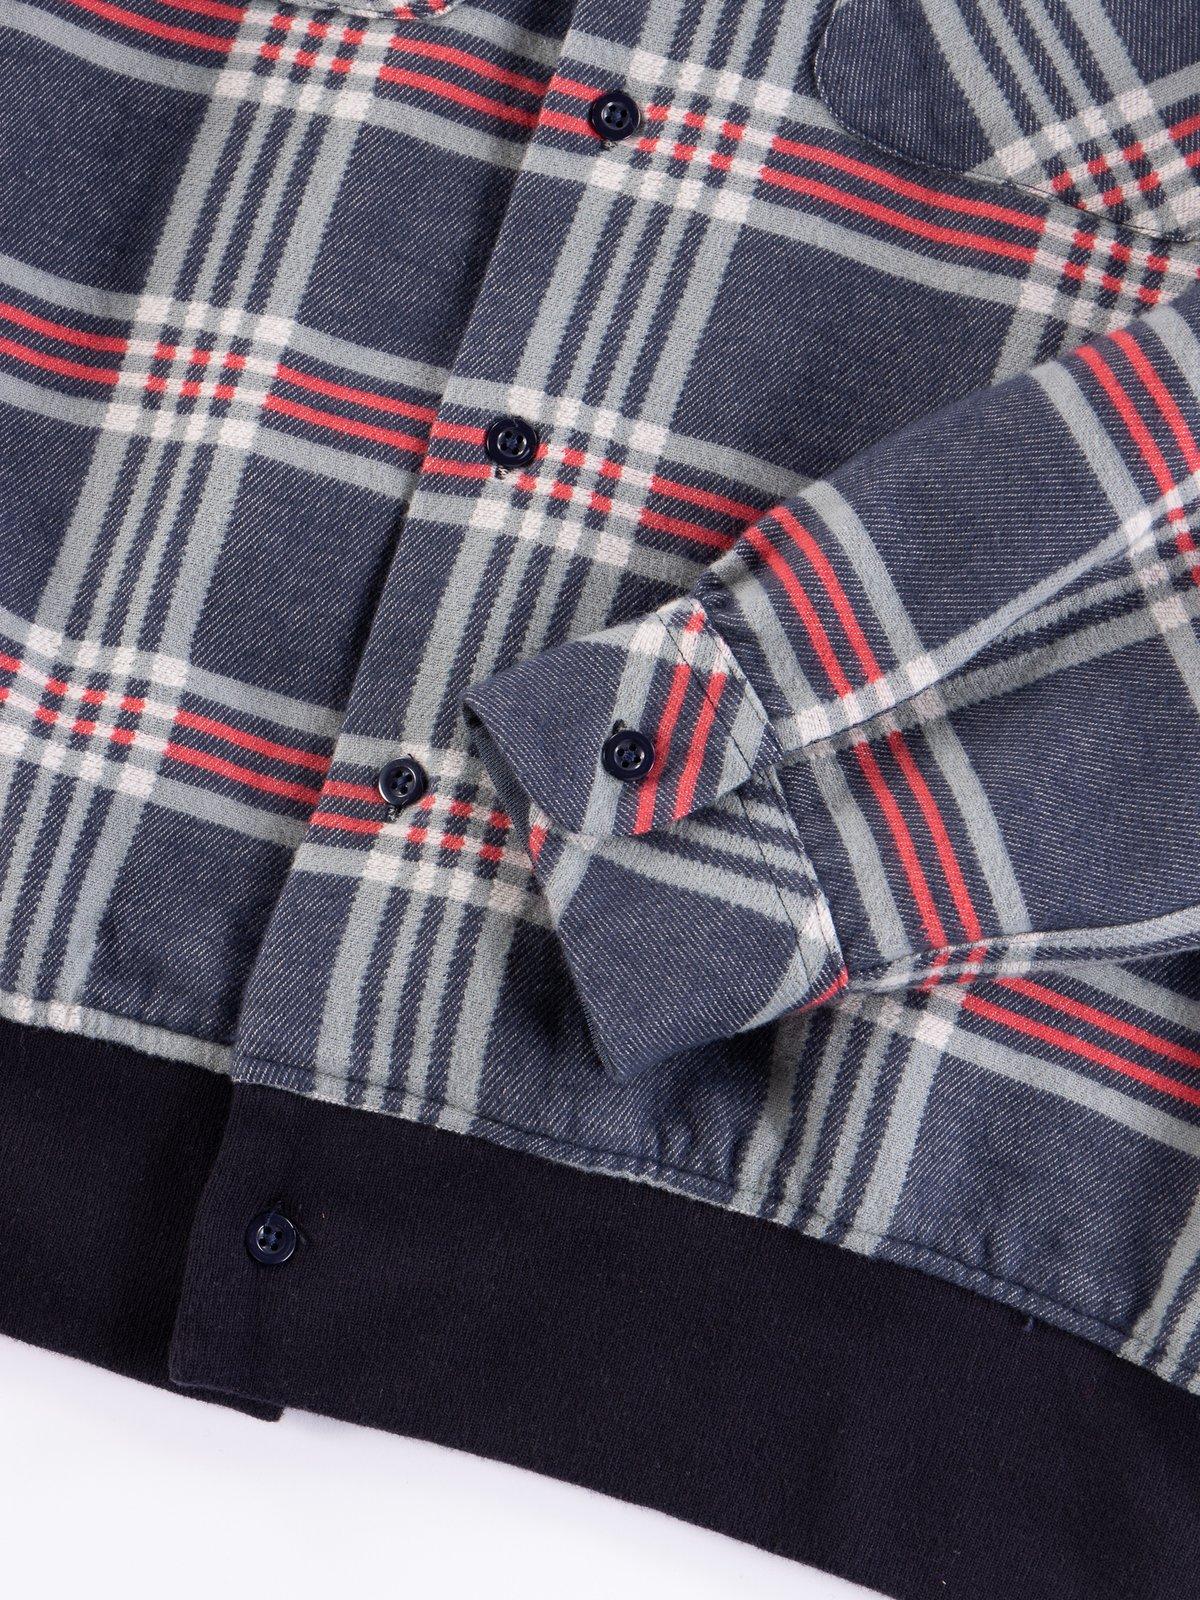 Navy/Teal/Red Big Plaid Classic Shirt - Image 5